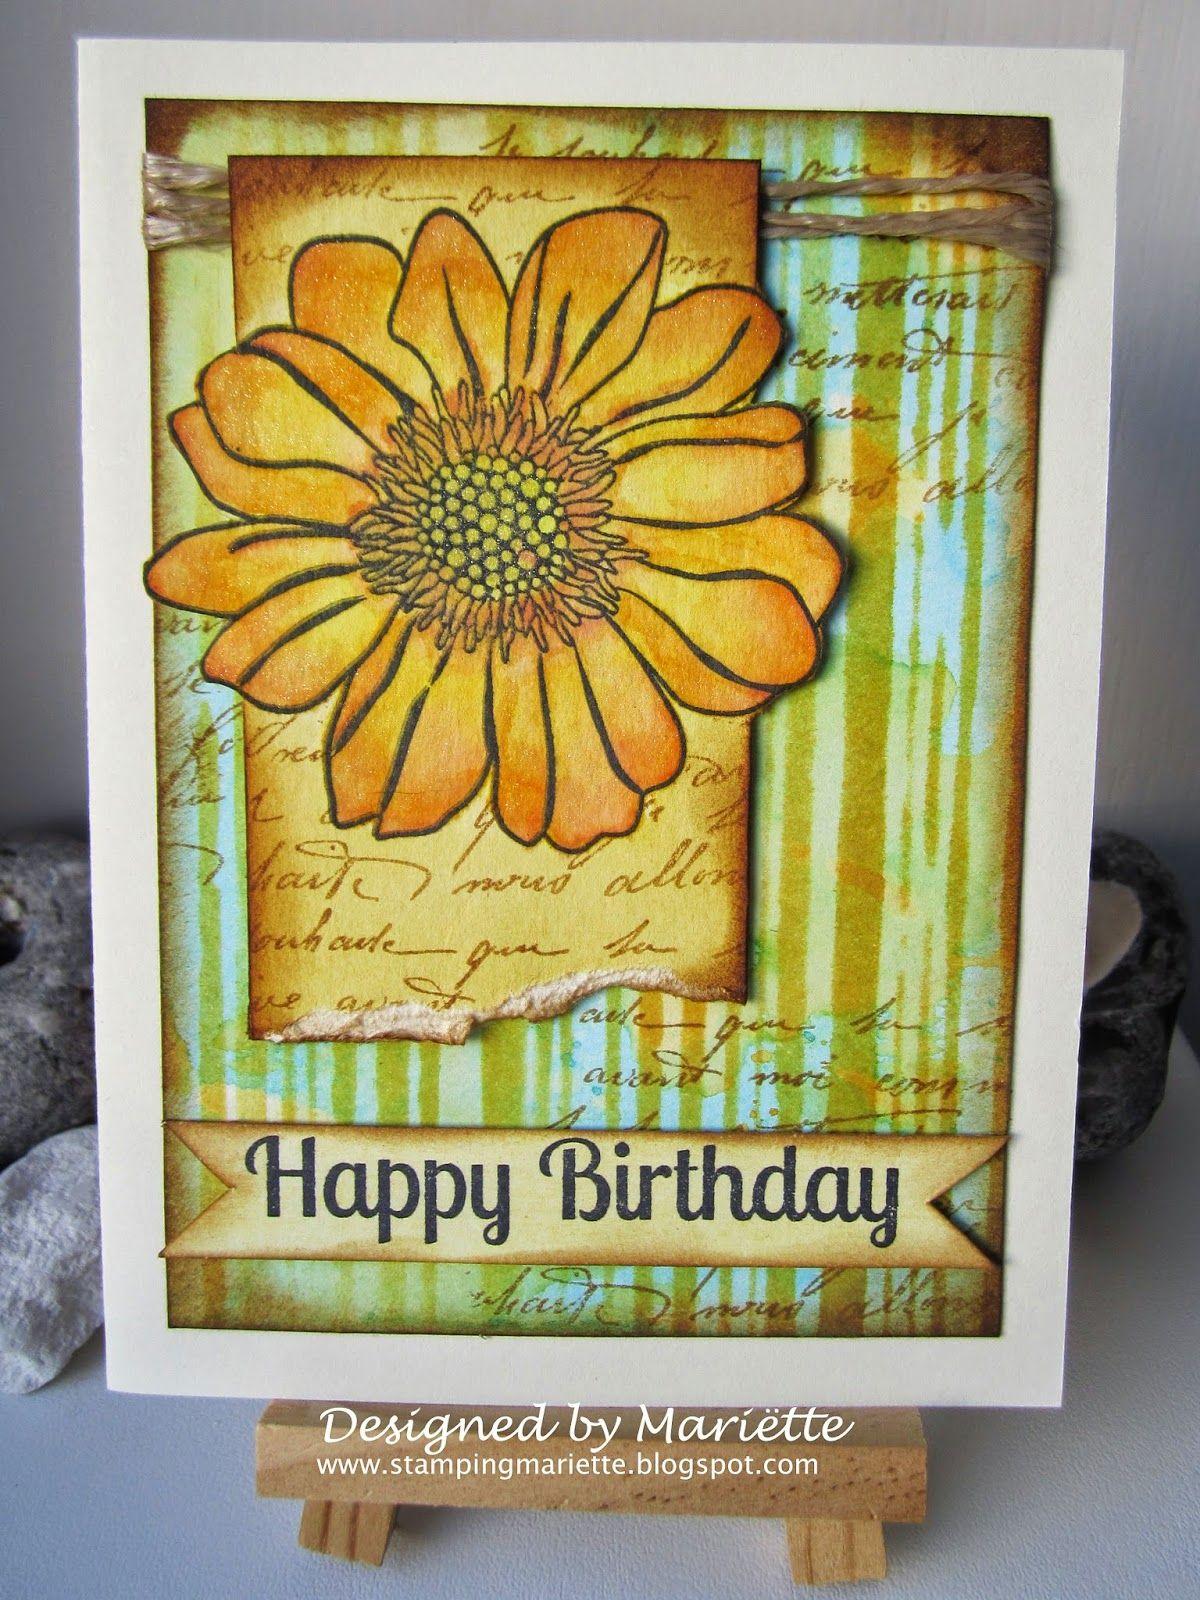 Happy Birthday card by Mariëtte